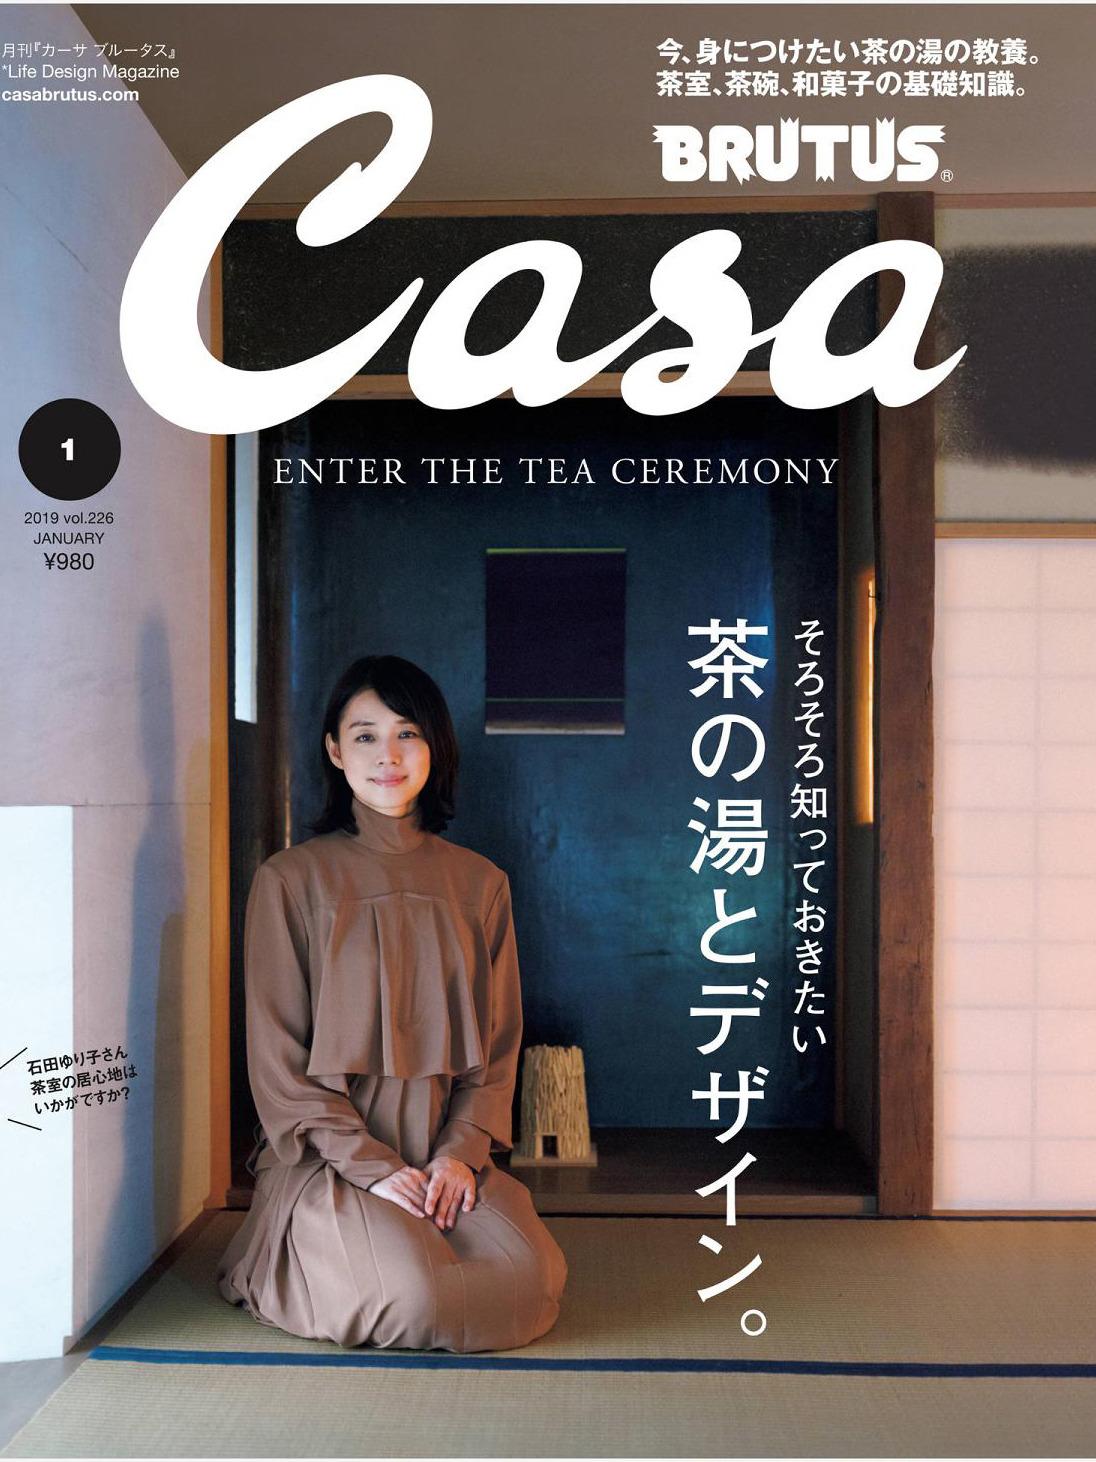 《Casa Brutus》日本室内设计流行趋势杂志2019年01月号